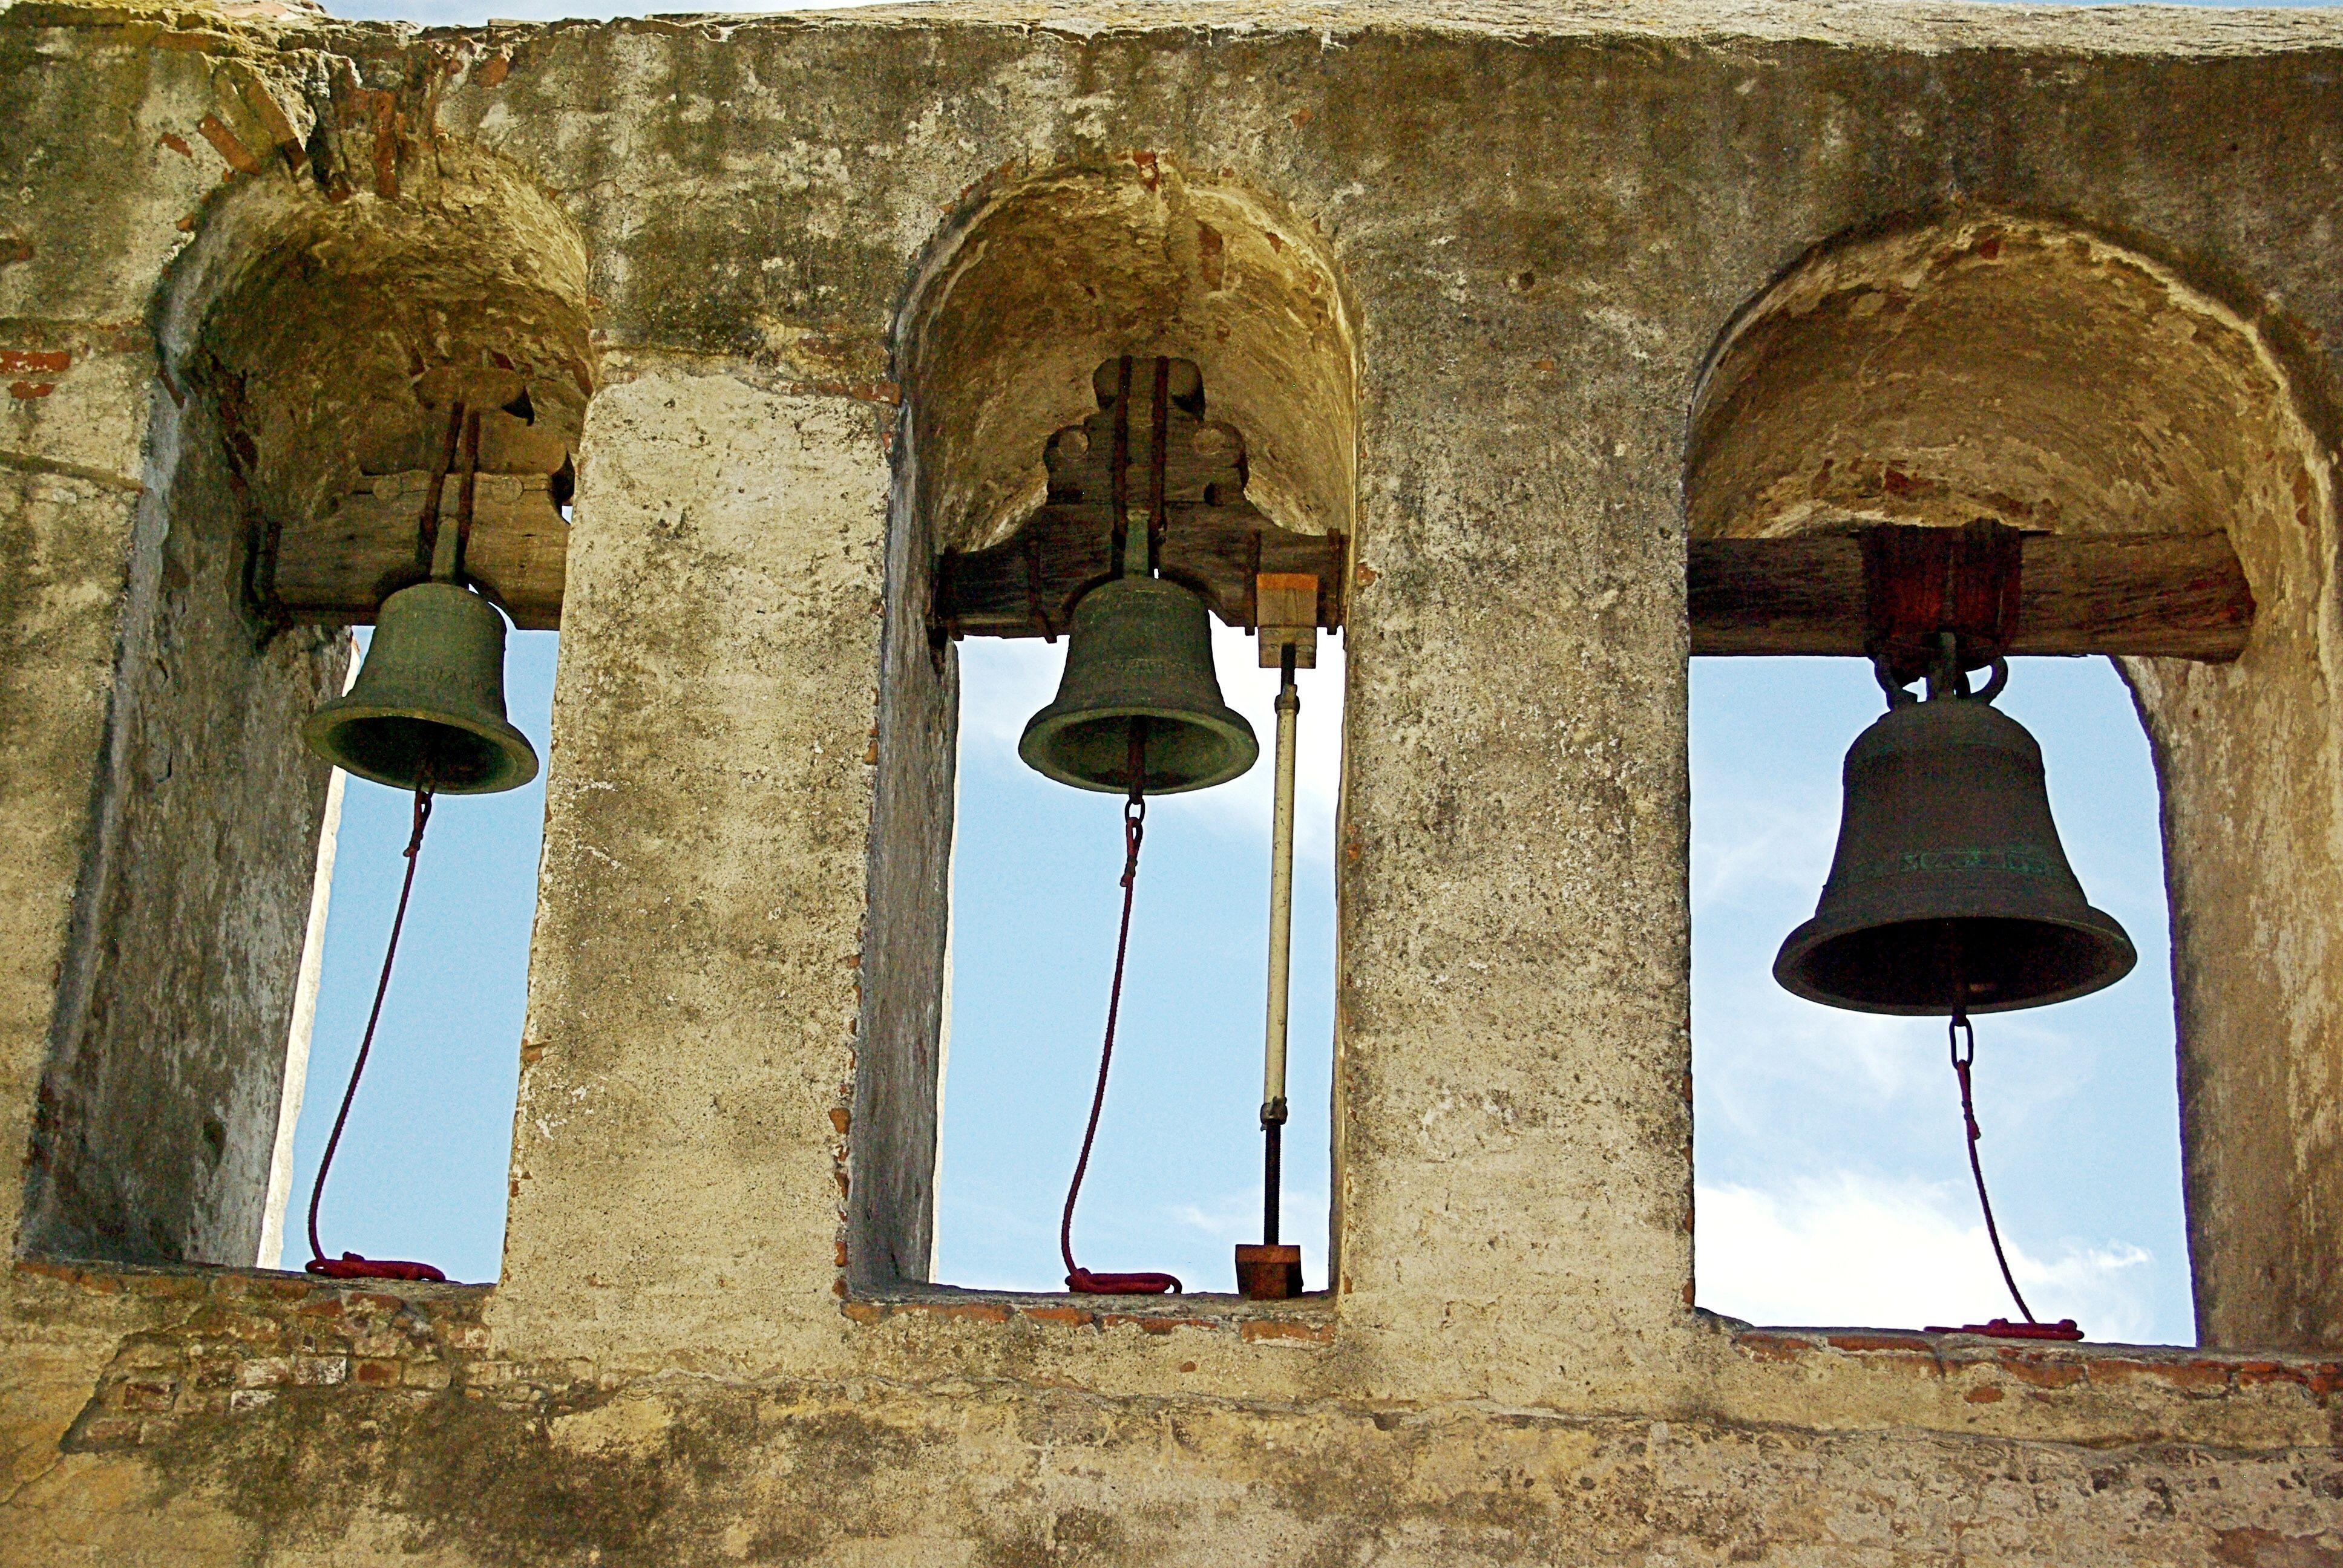 Mission Bells at San Juan Capistrano